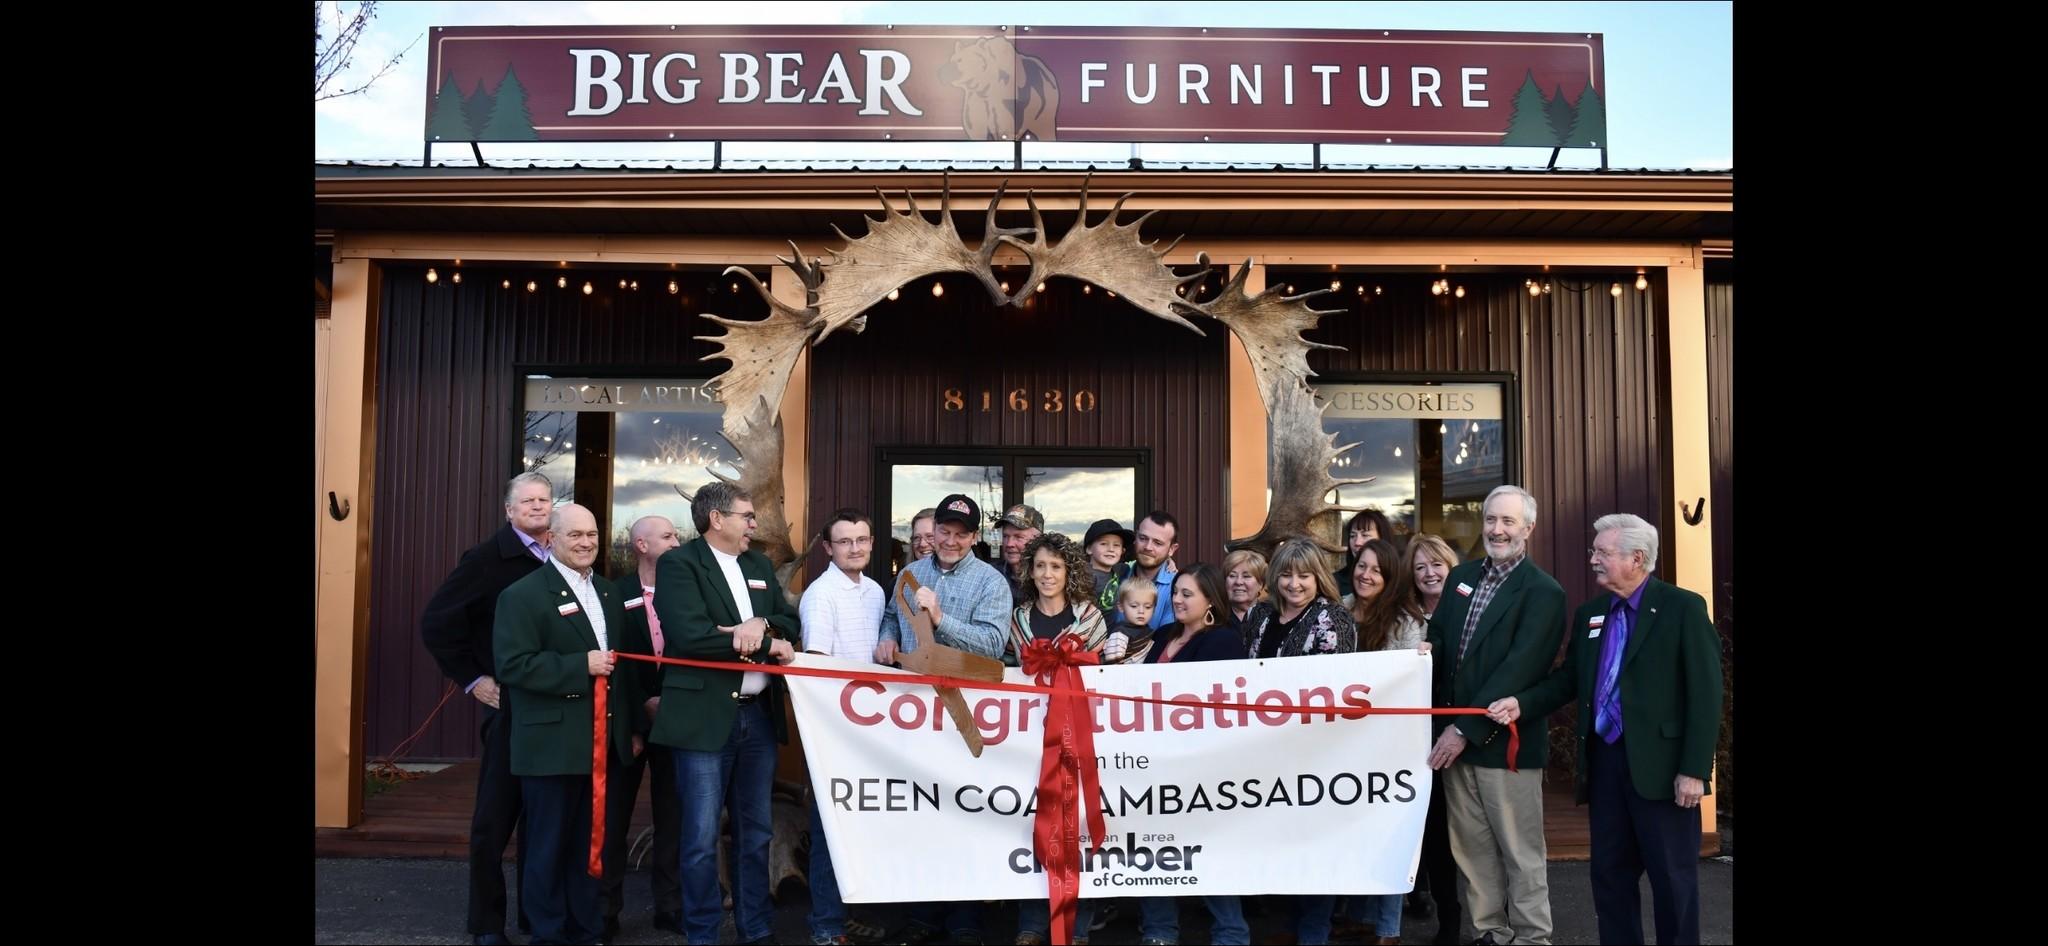 Welcome to Big Bear Furniture